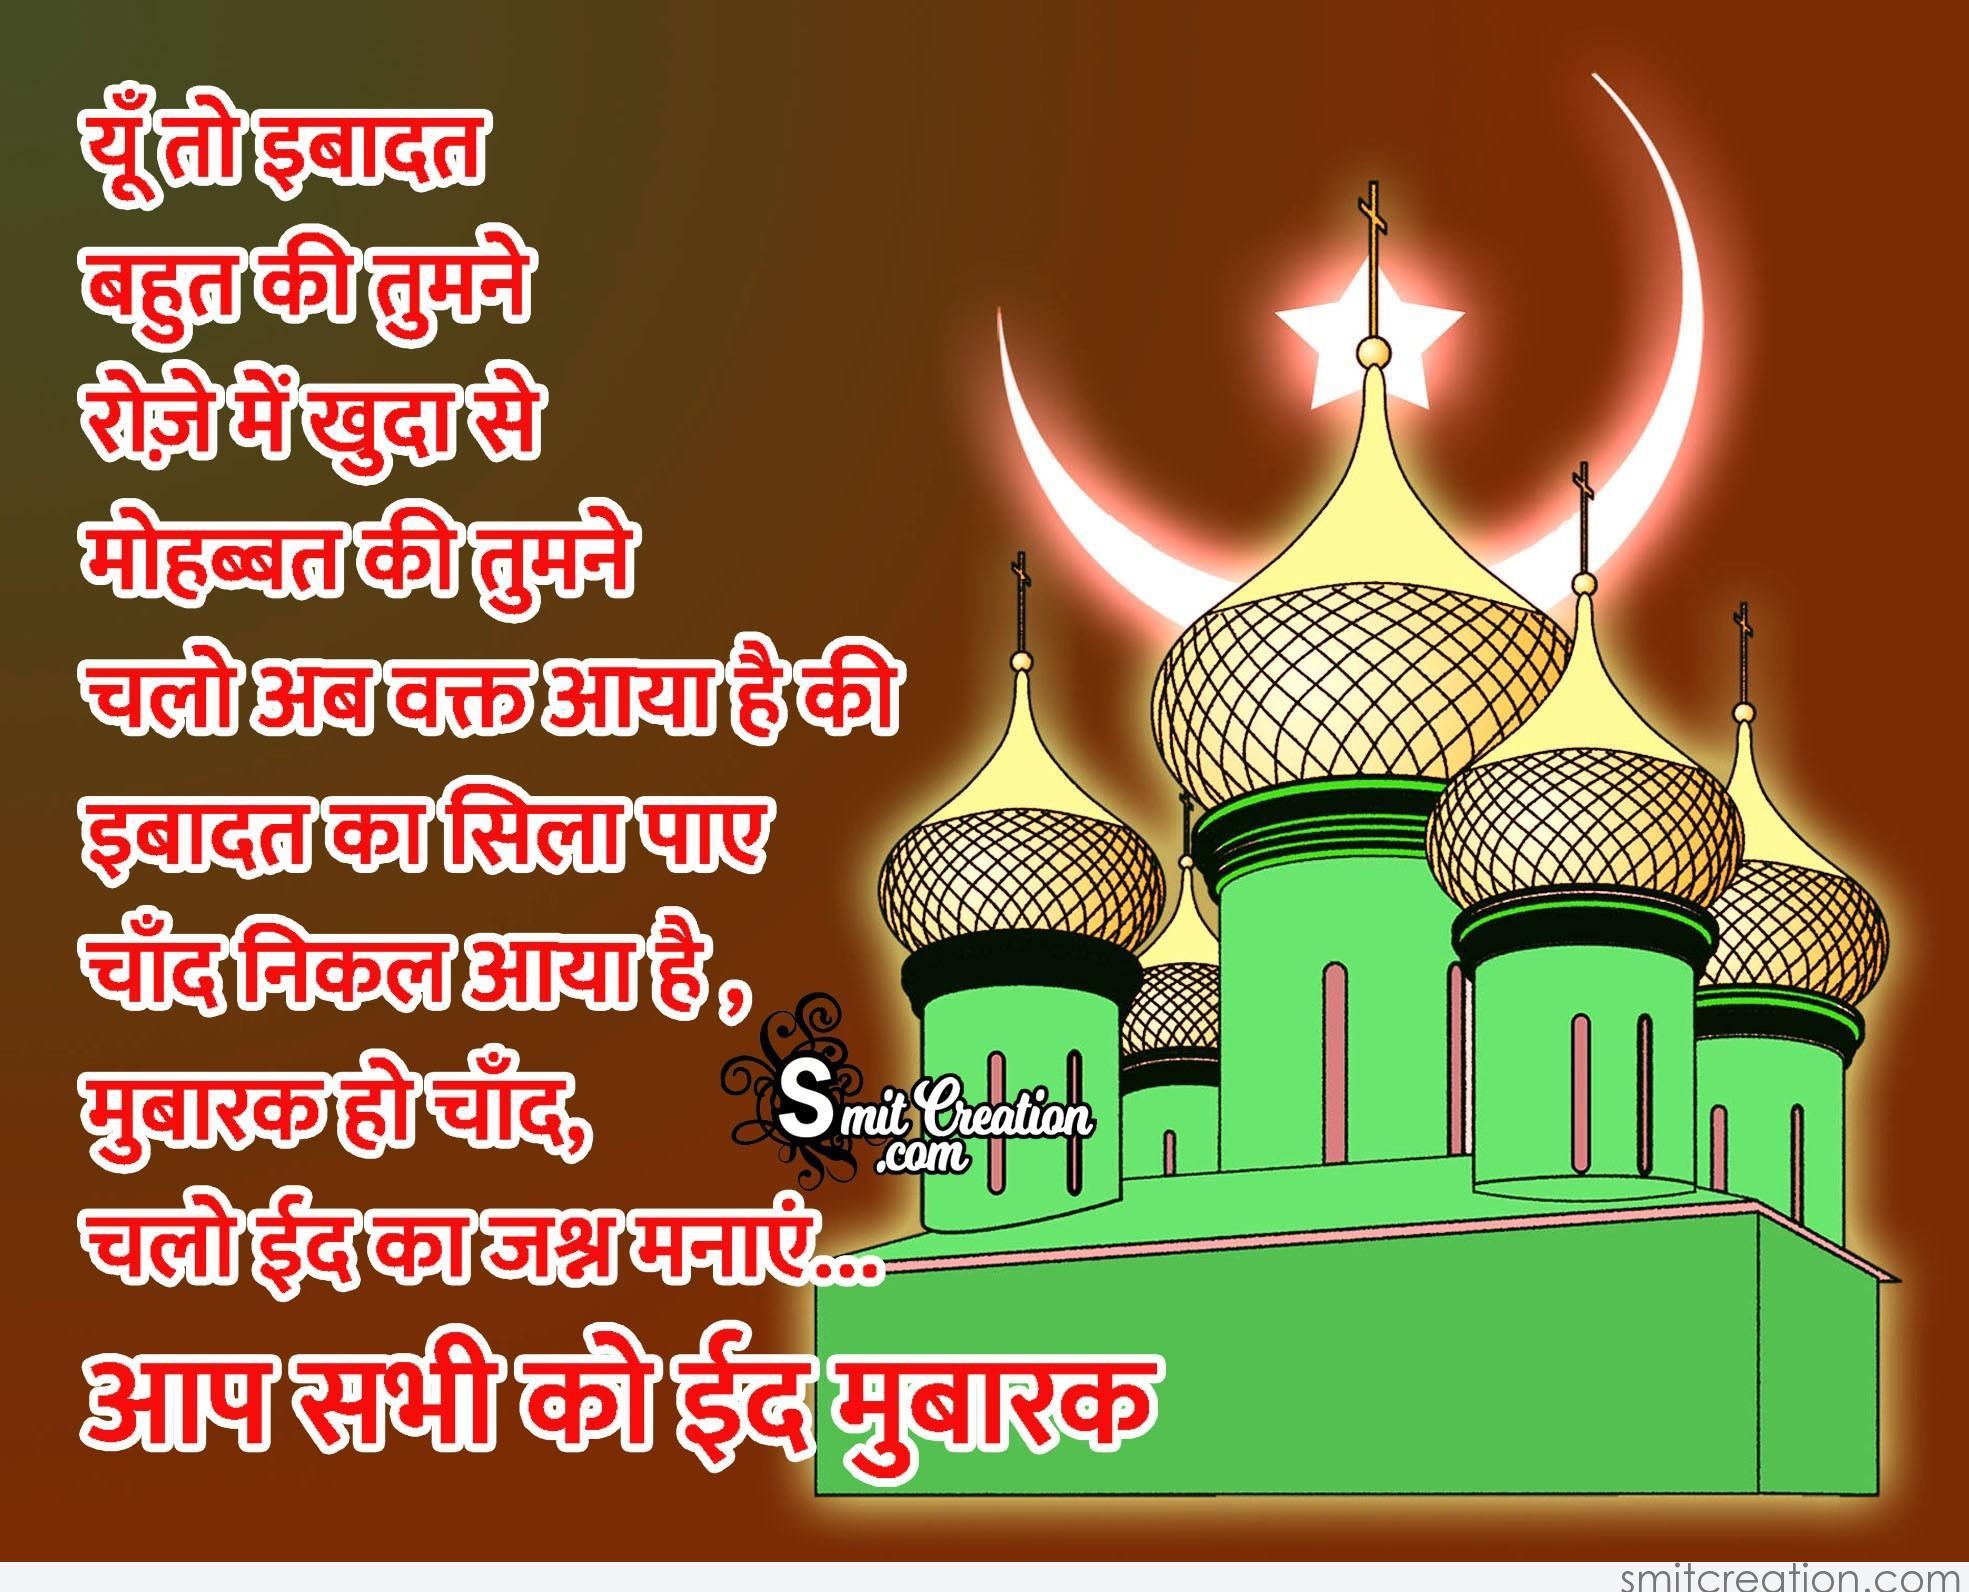 Aap Sabhi Ko Eid Mubarak Smitcreation Com